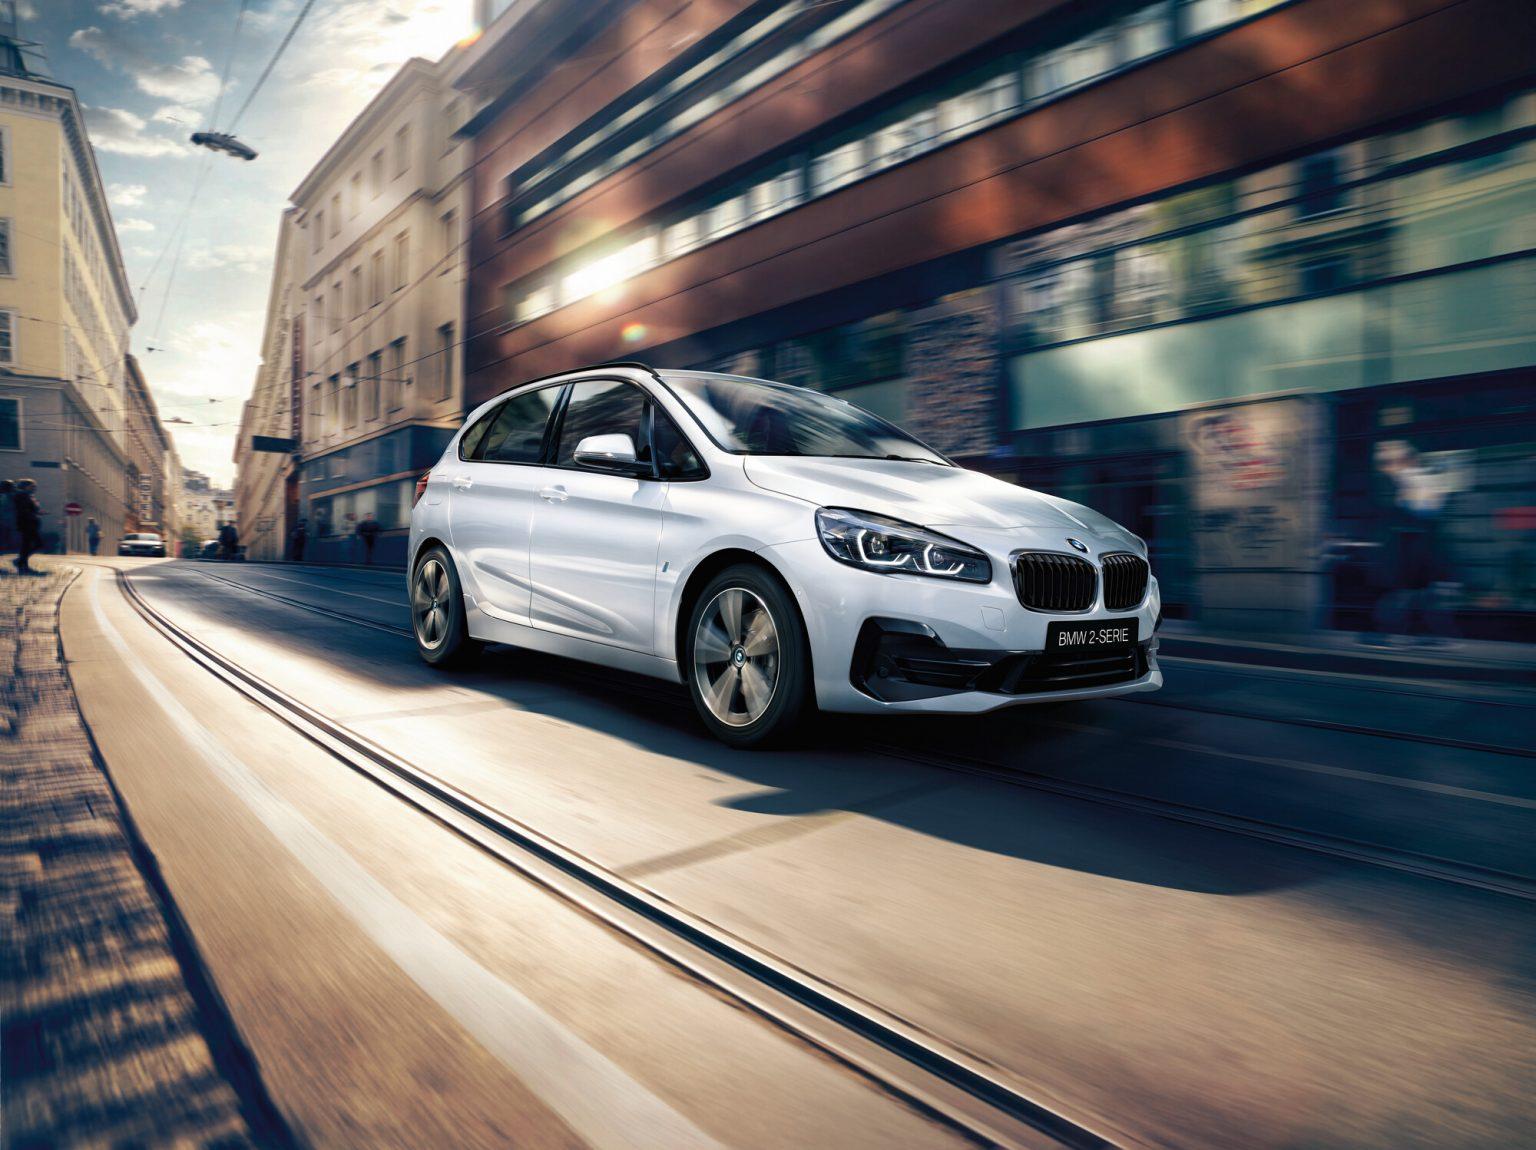 BMW 2 Series Active Tourer eDrive (F45 LCI) - 225xe A0245403